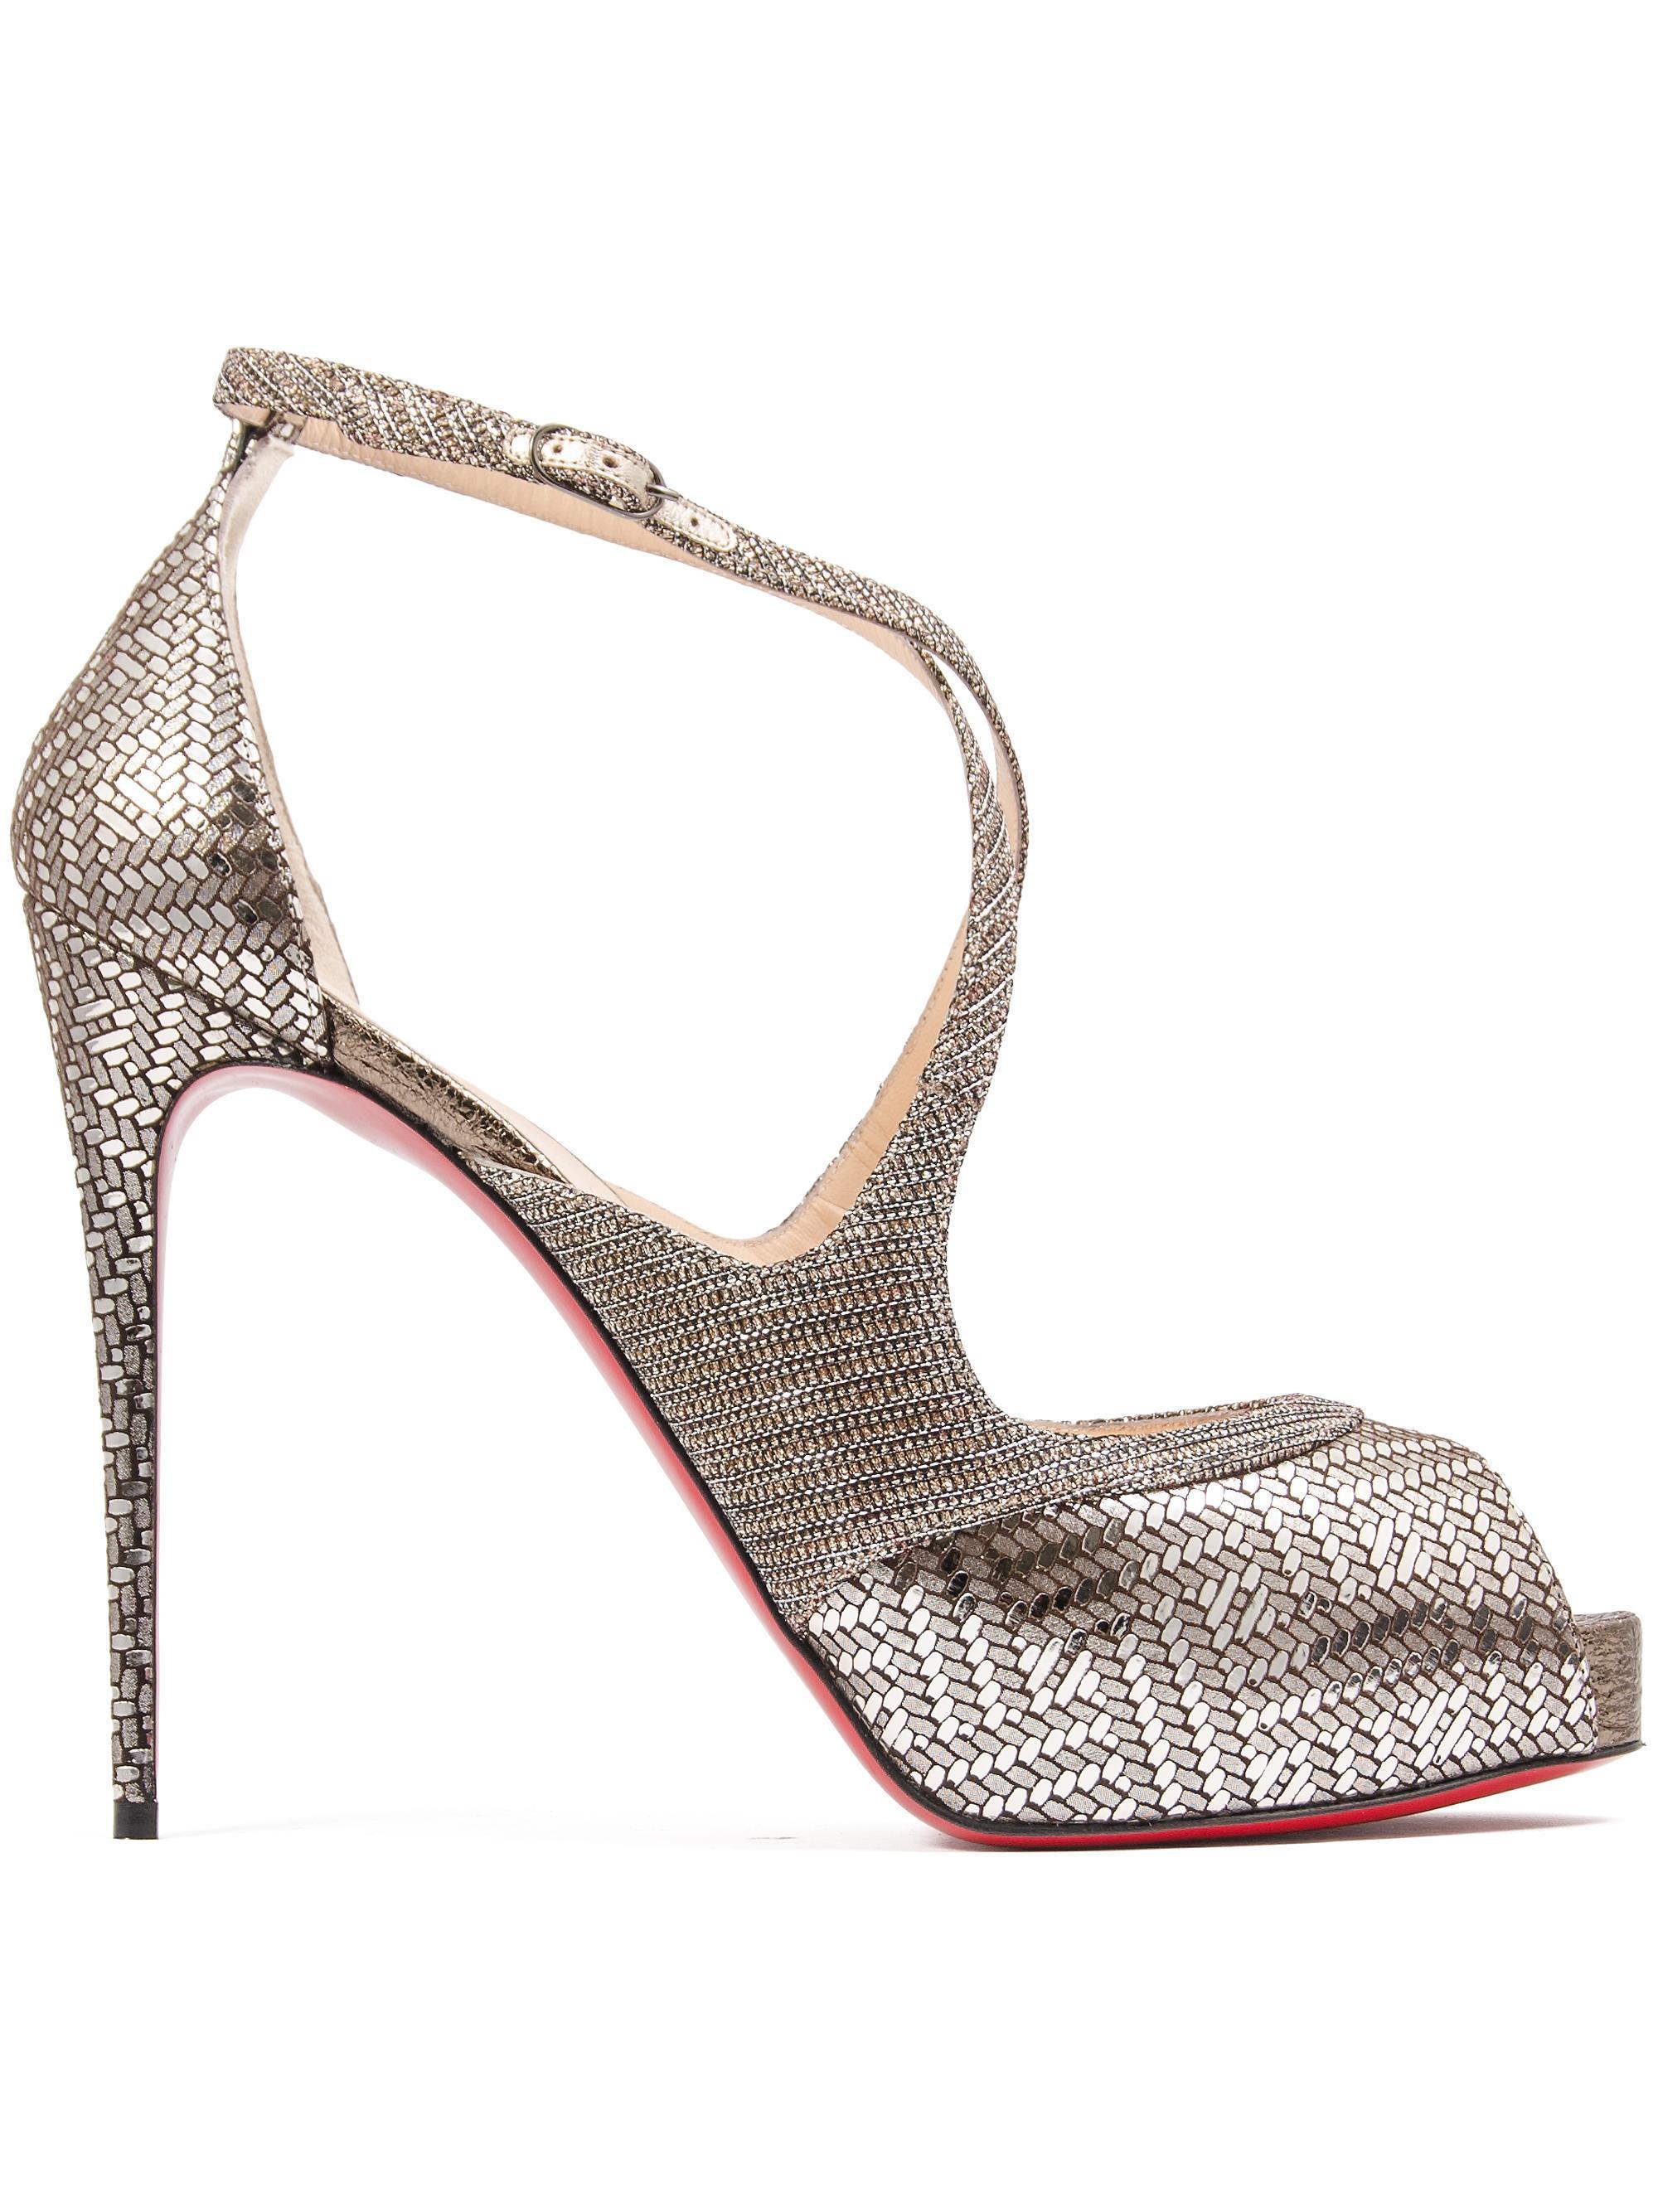 bb16664805c Christian Louboutin Multicolor Mira Bella 120 Sandals